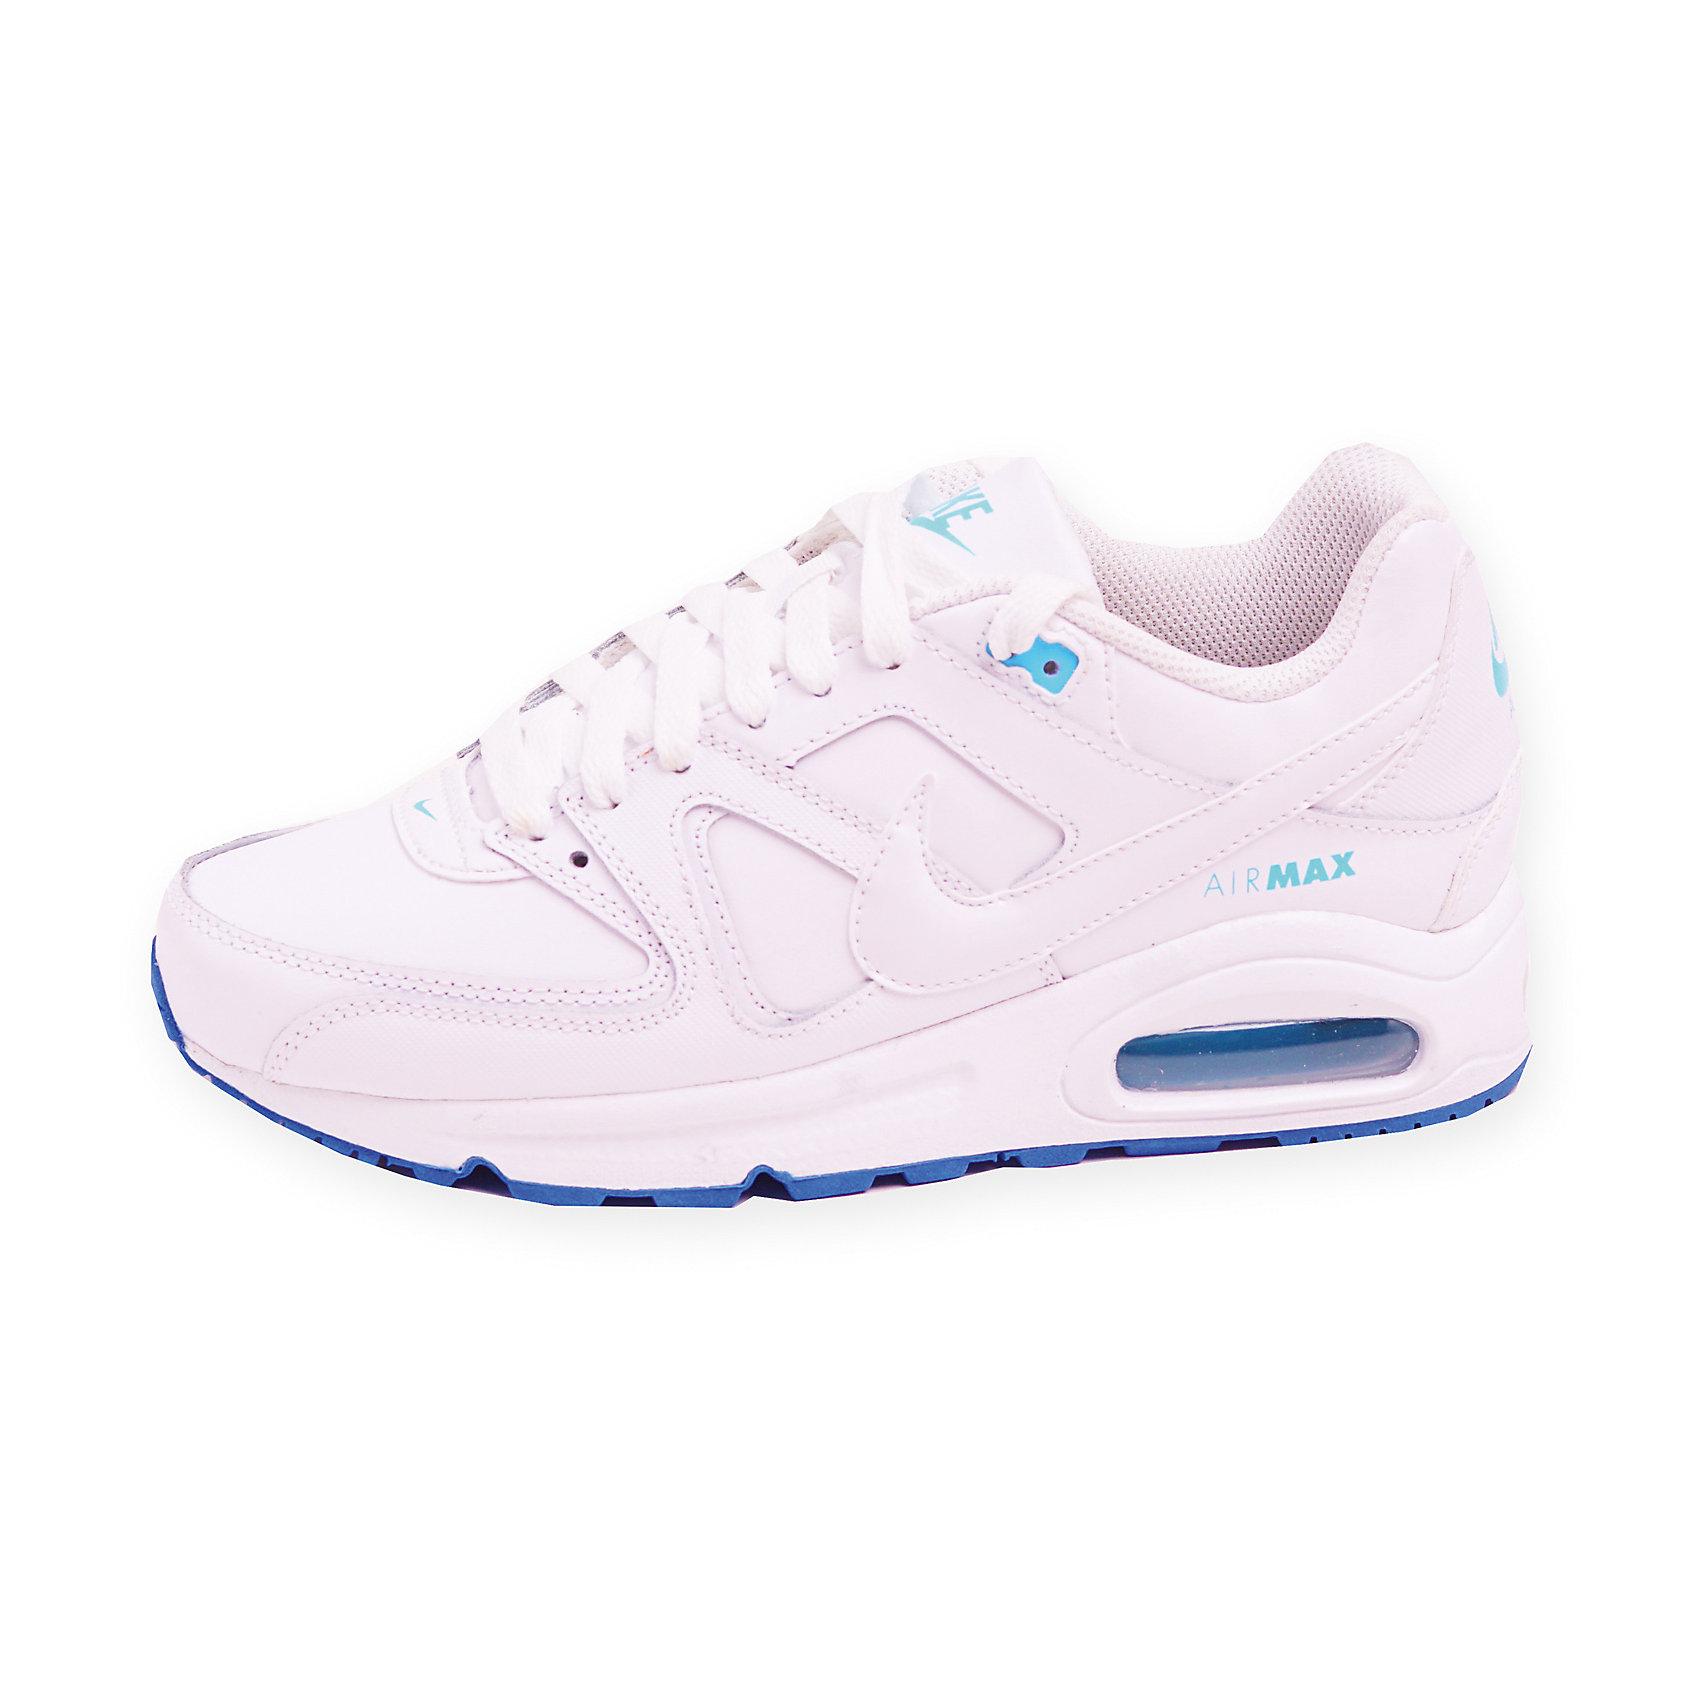 7dfb78466318 ... Nike Air Max 90 купить недорого в интернет. Кроссовки Для Девочки Air  Max Command ...